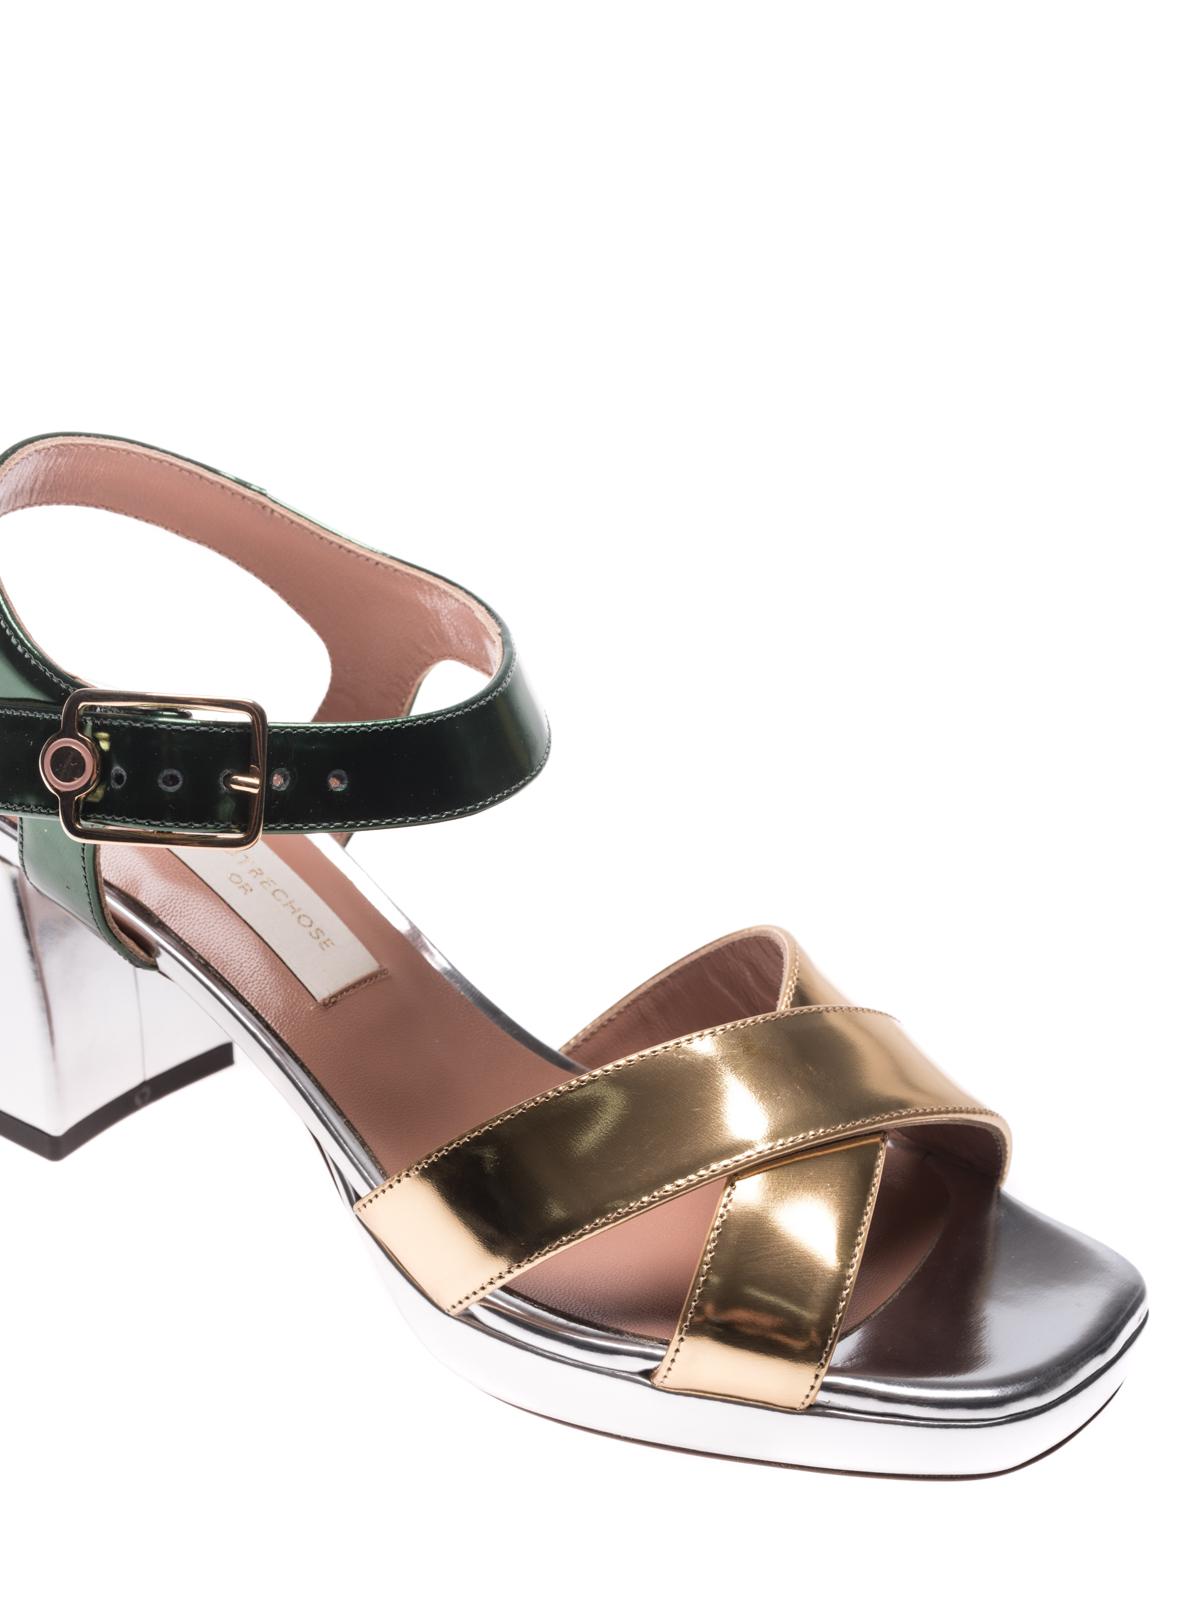 L Autre Chose Mirrored sandals Outlet Finishline 2Iyc6q